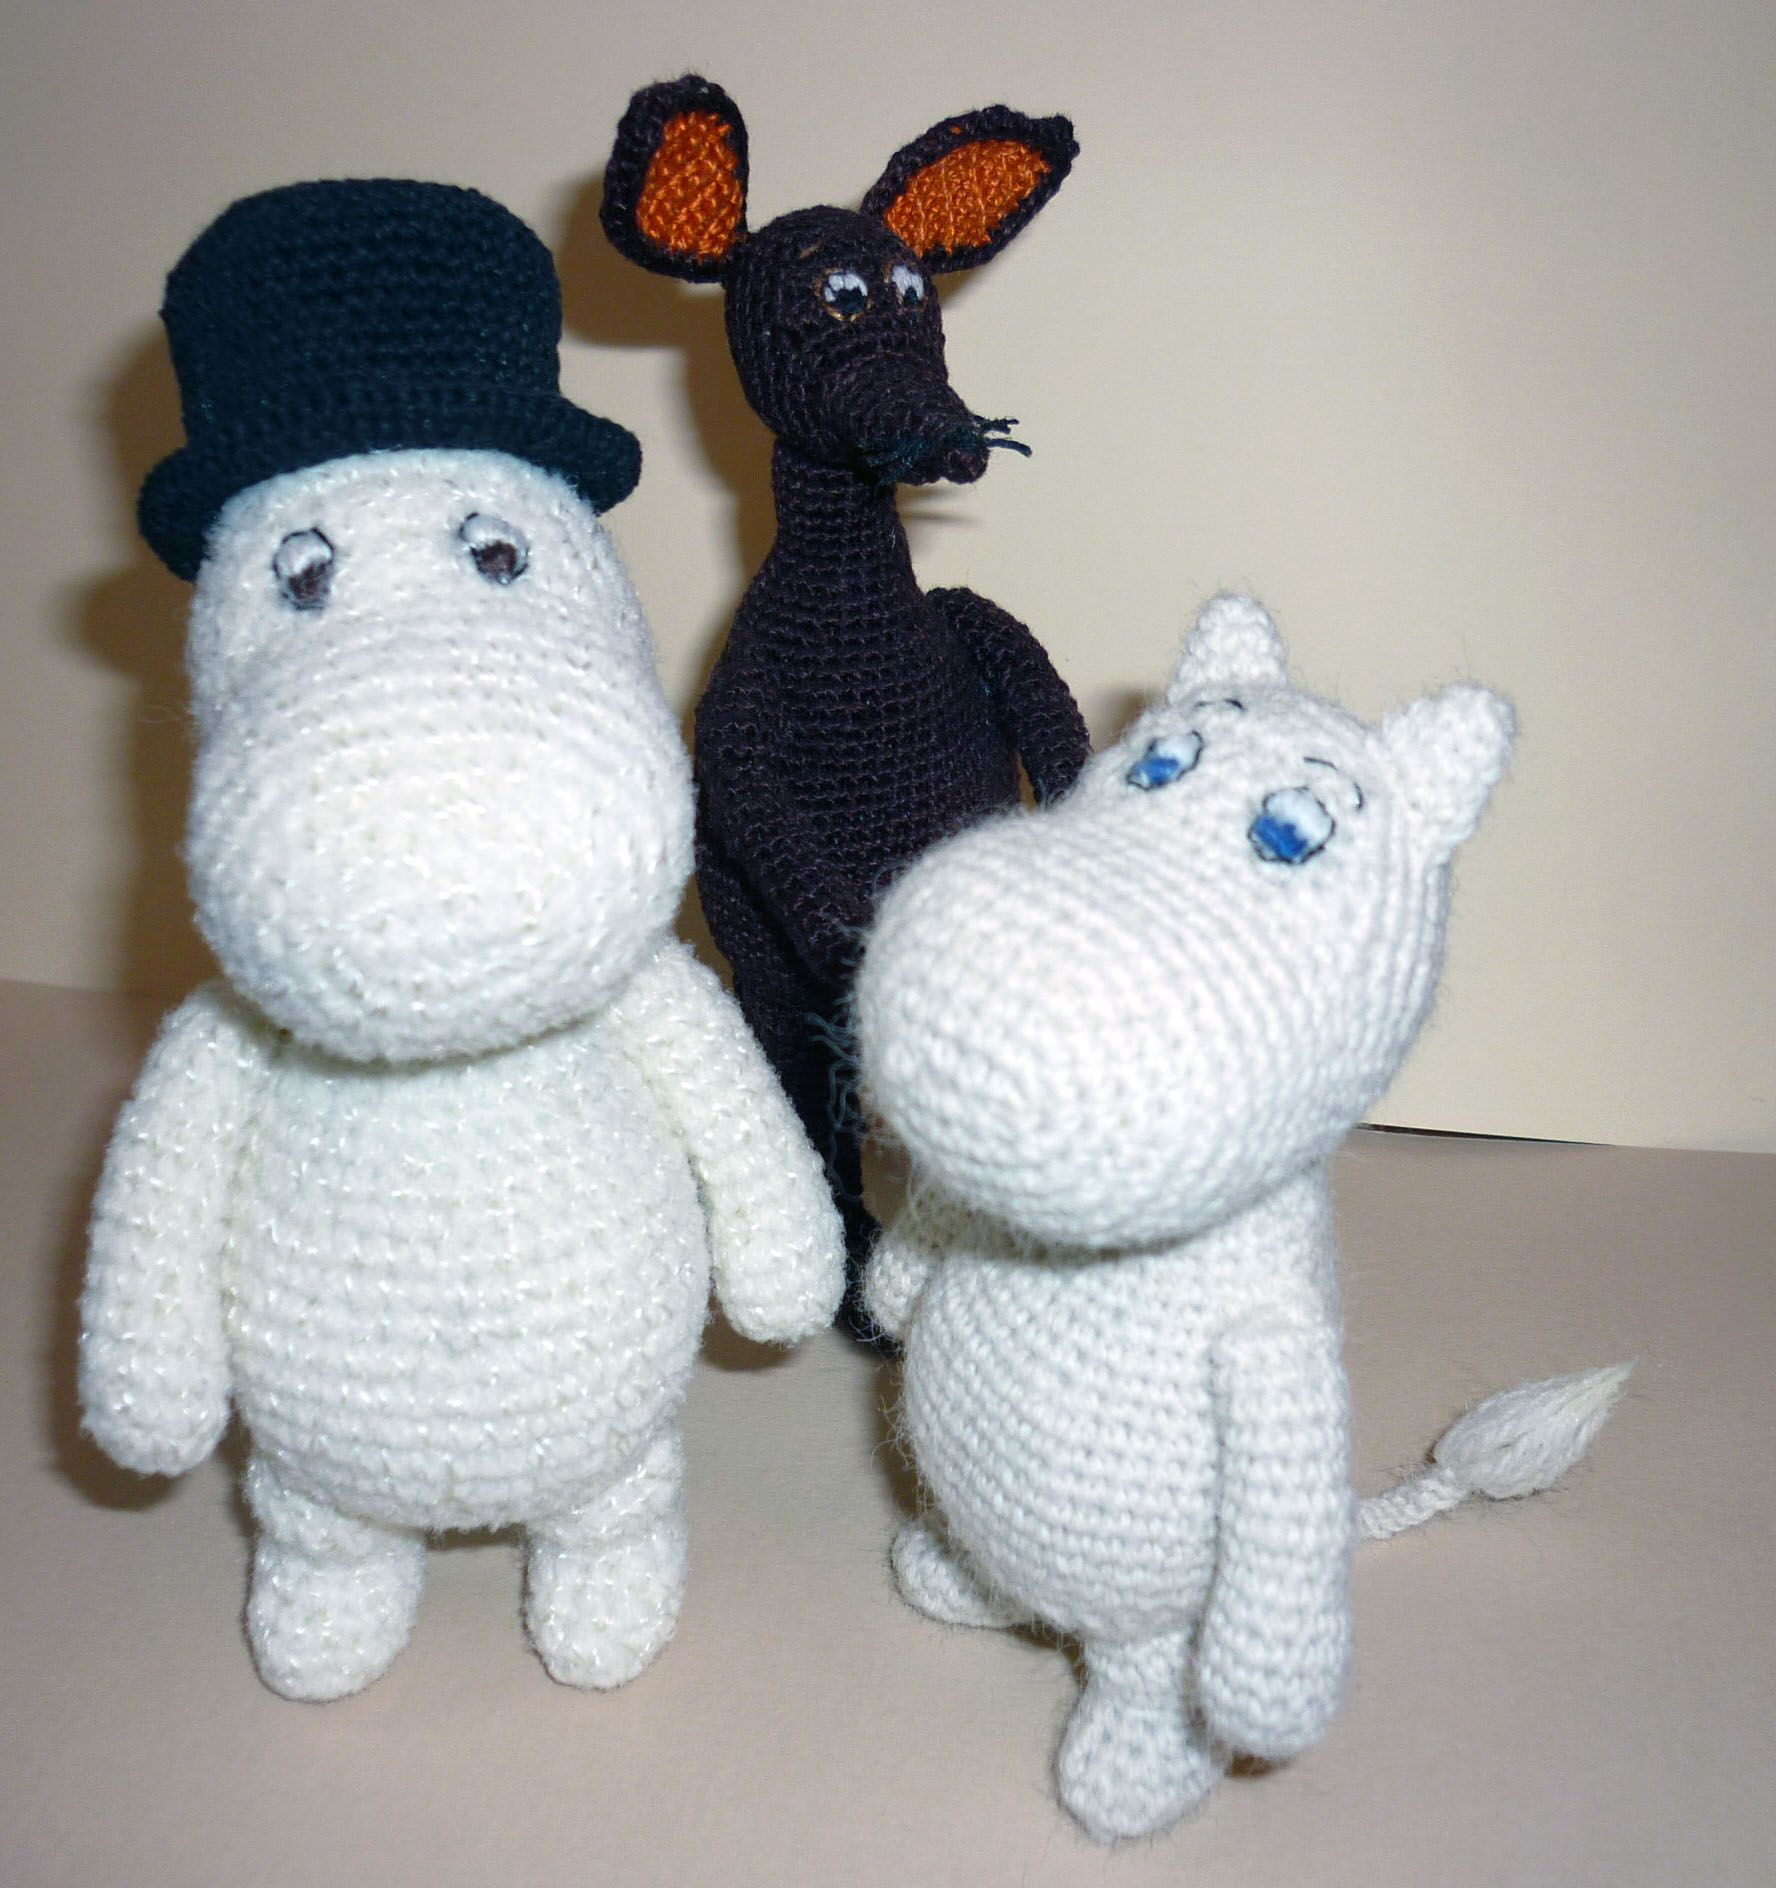 Moomins | Moomin | Pinterest